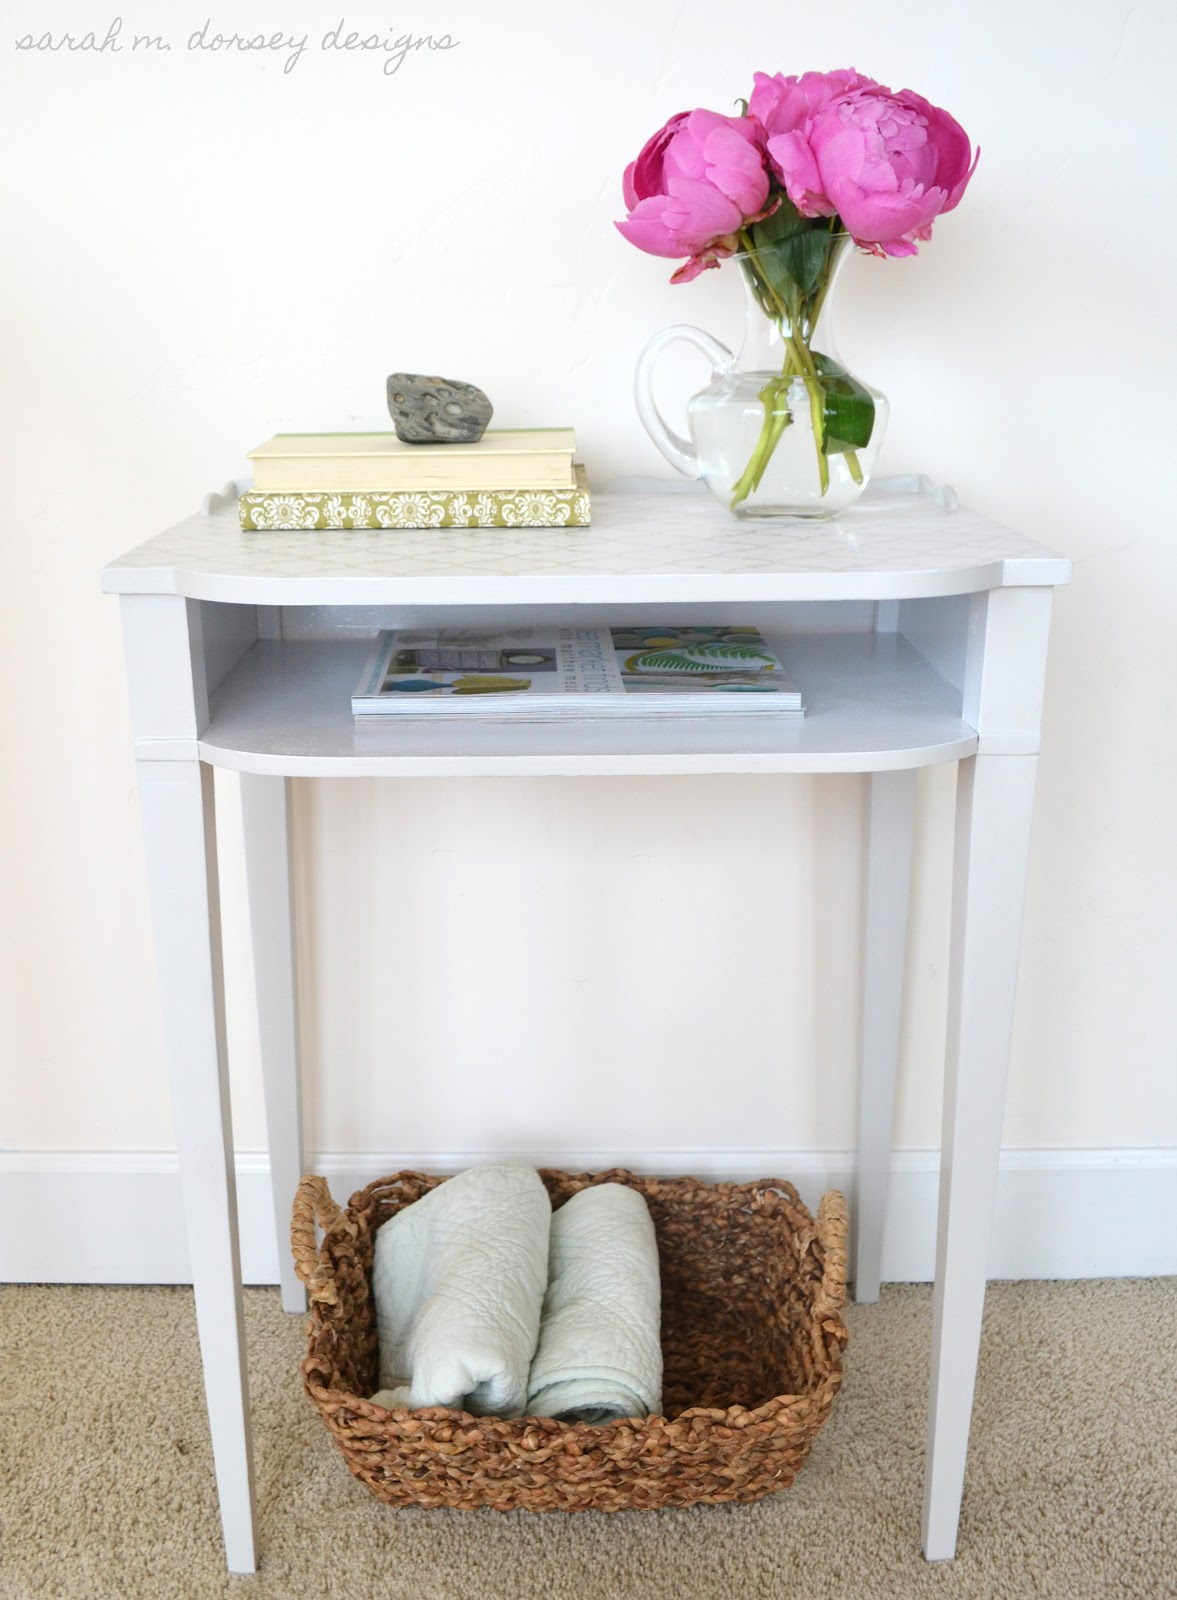 Craigslist Table Saw For Sale